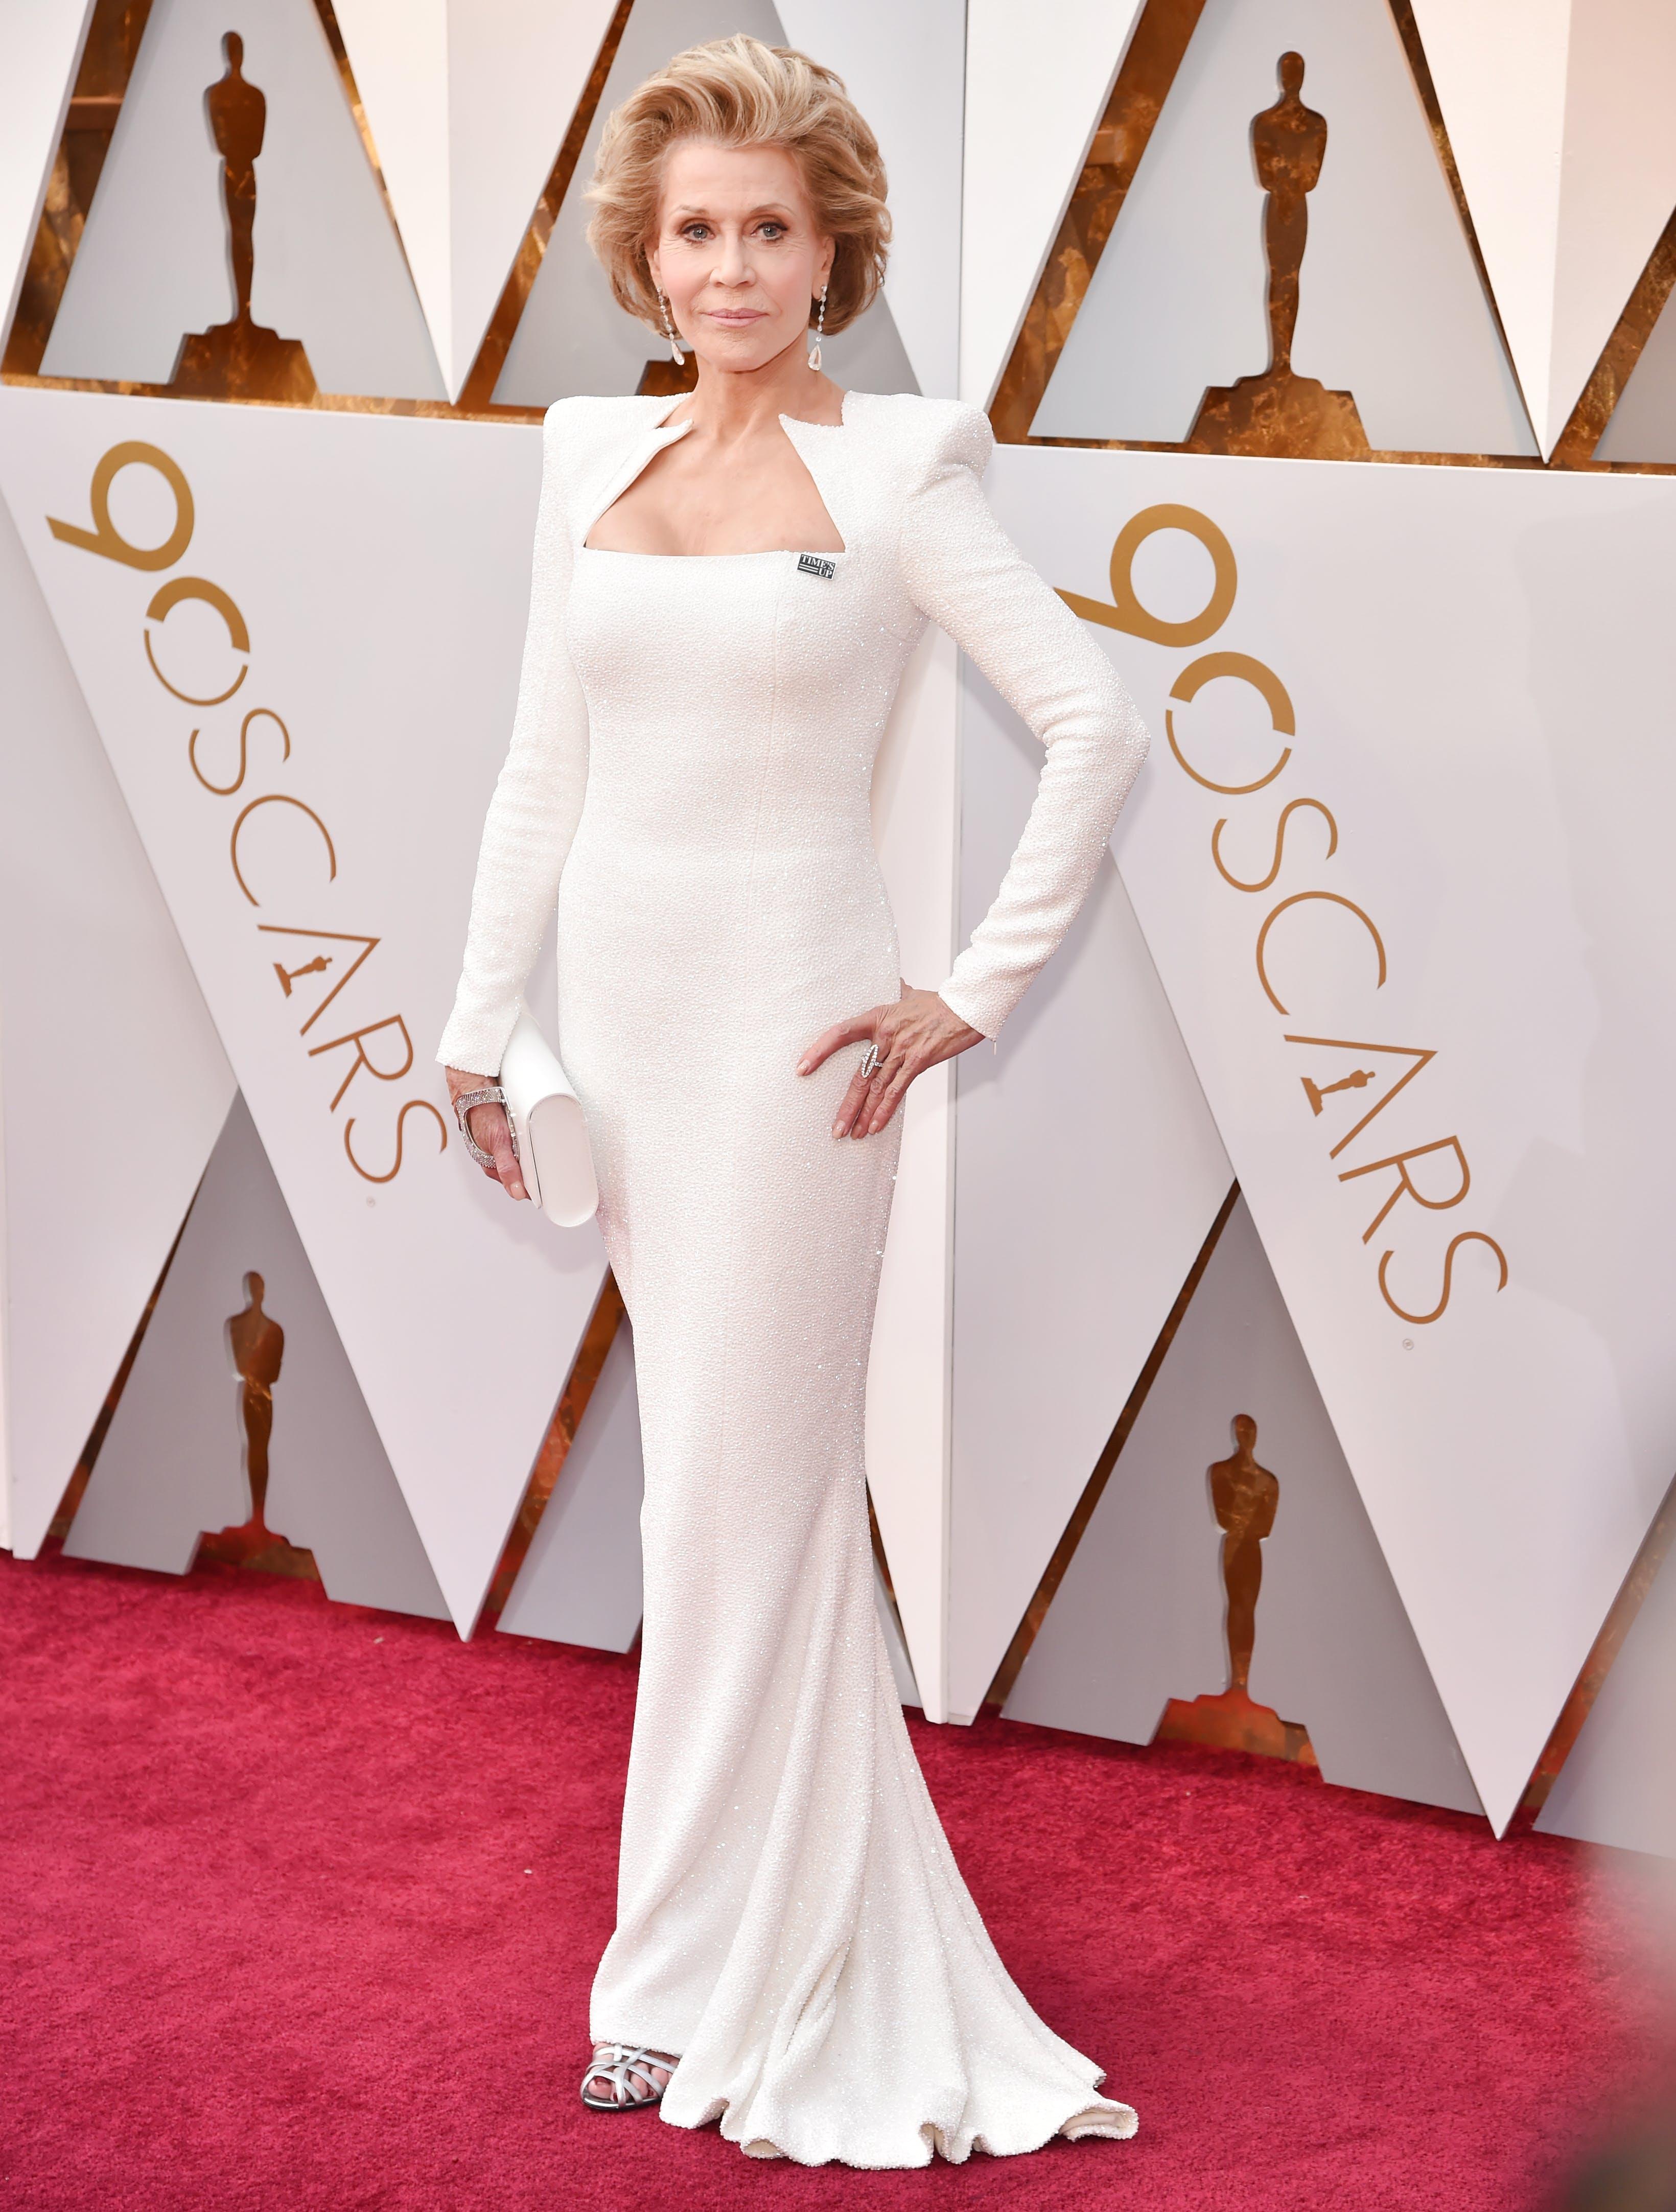 Jane Fonda at the 2018 Oscars